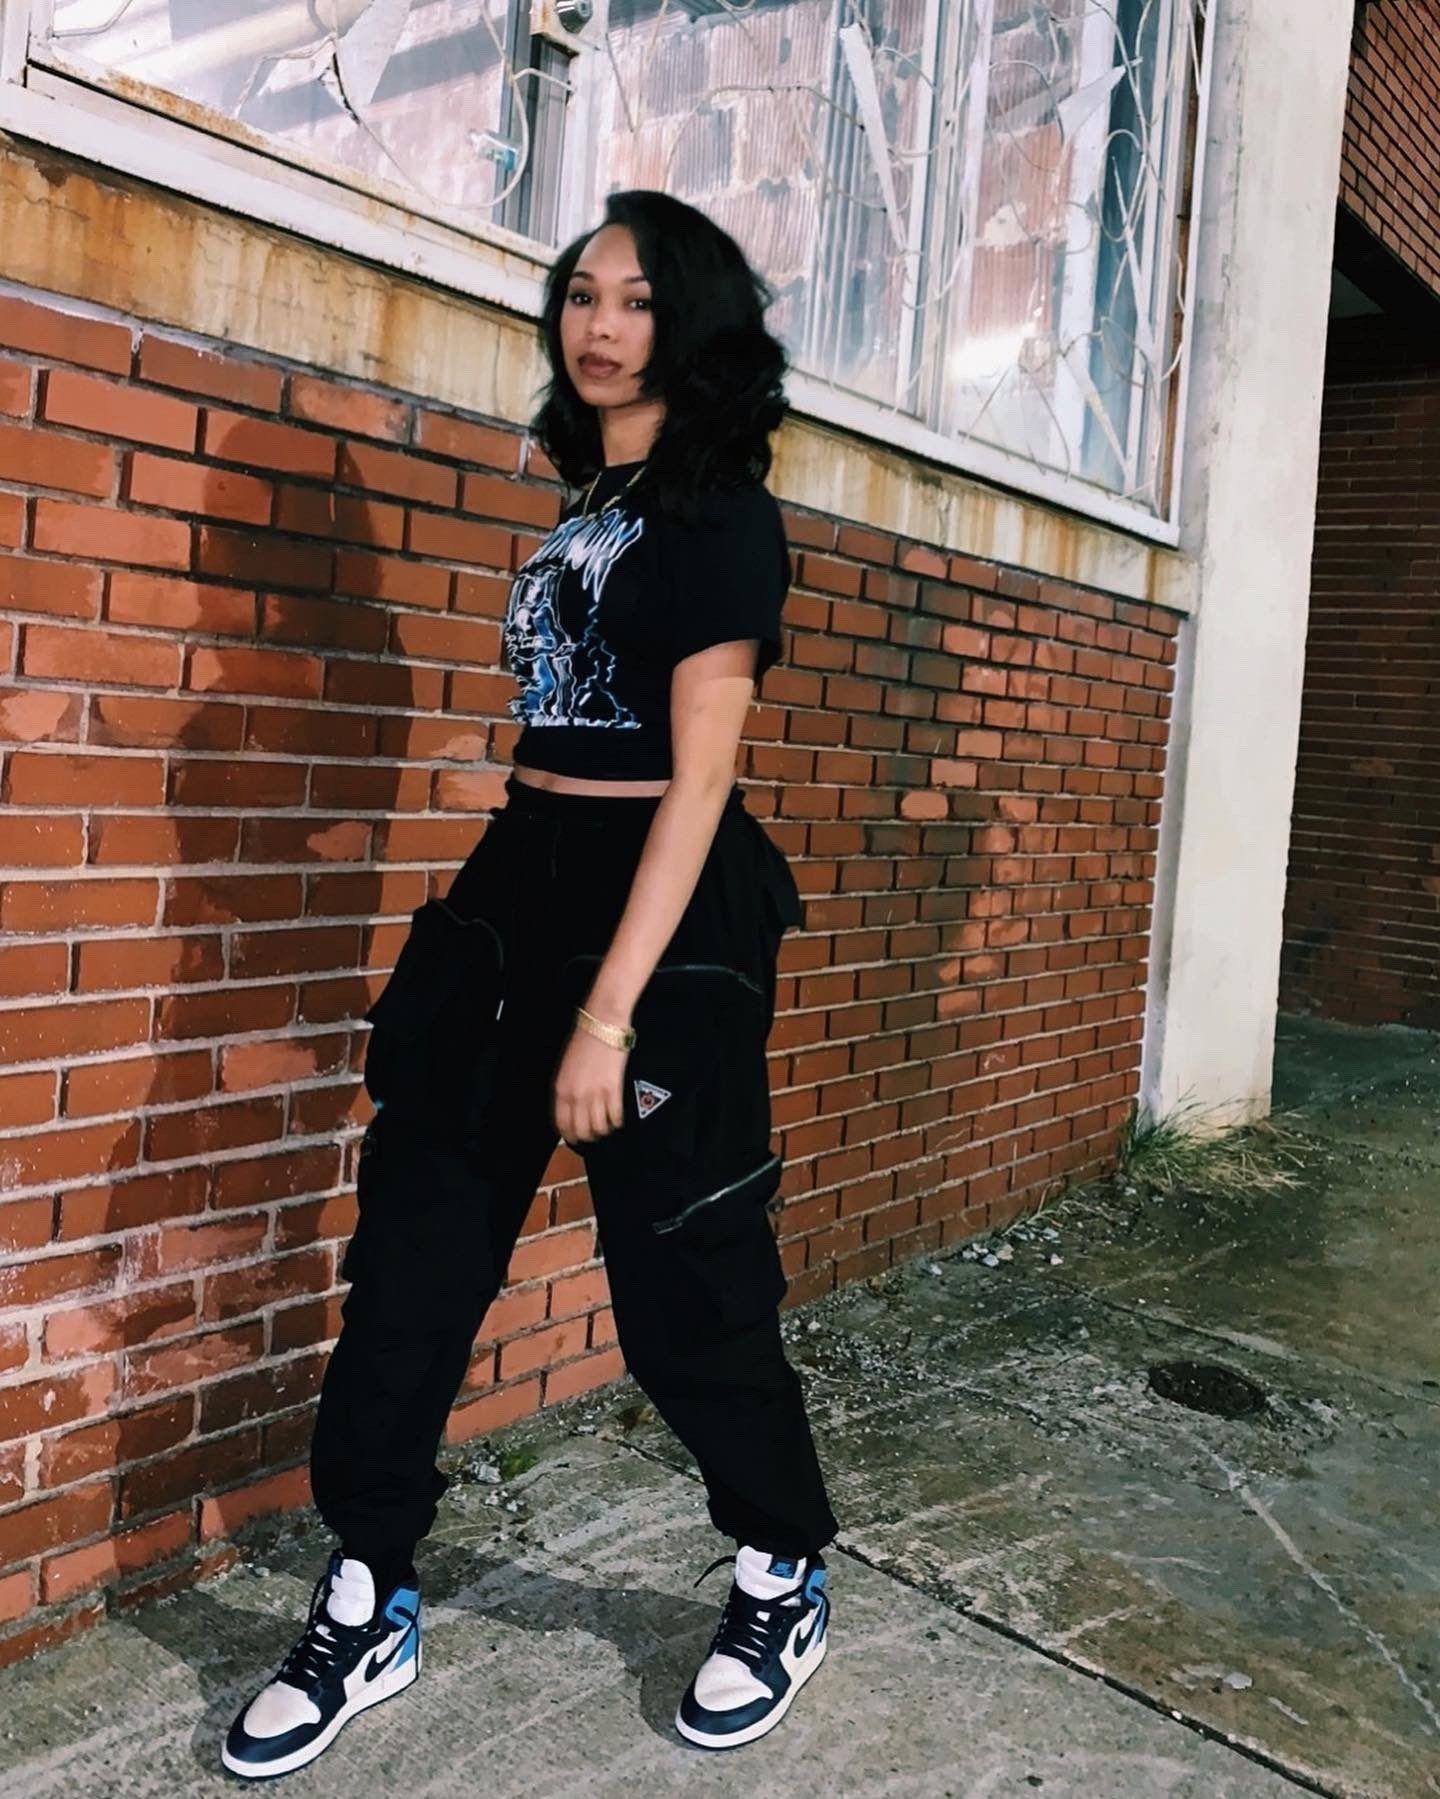 Pzy✨ on  Black girl outfits, Black girl fashion, Streetwear fashion